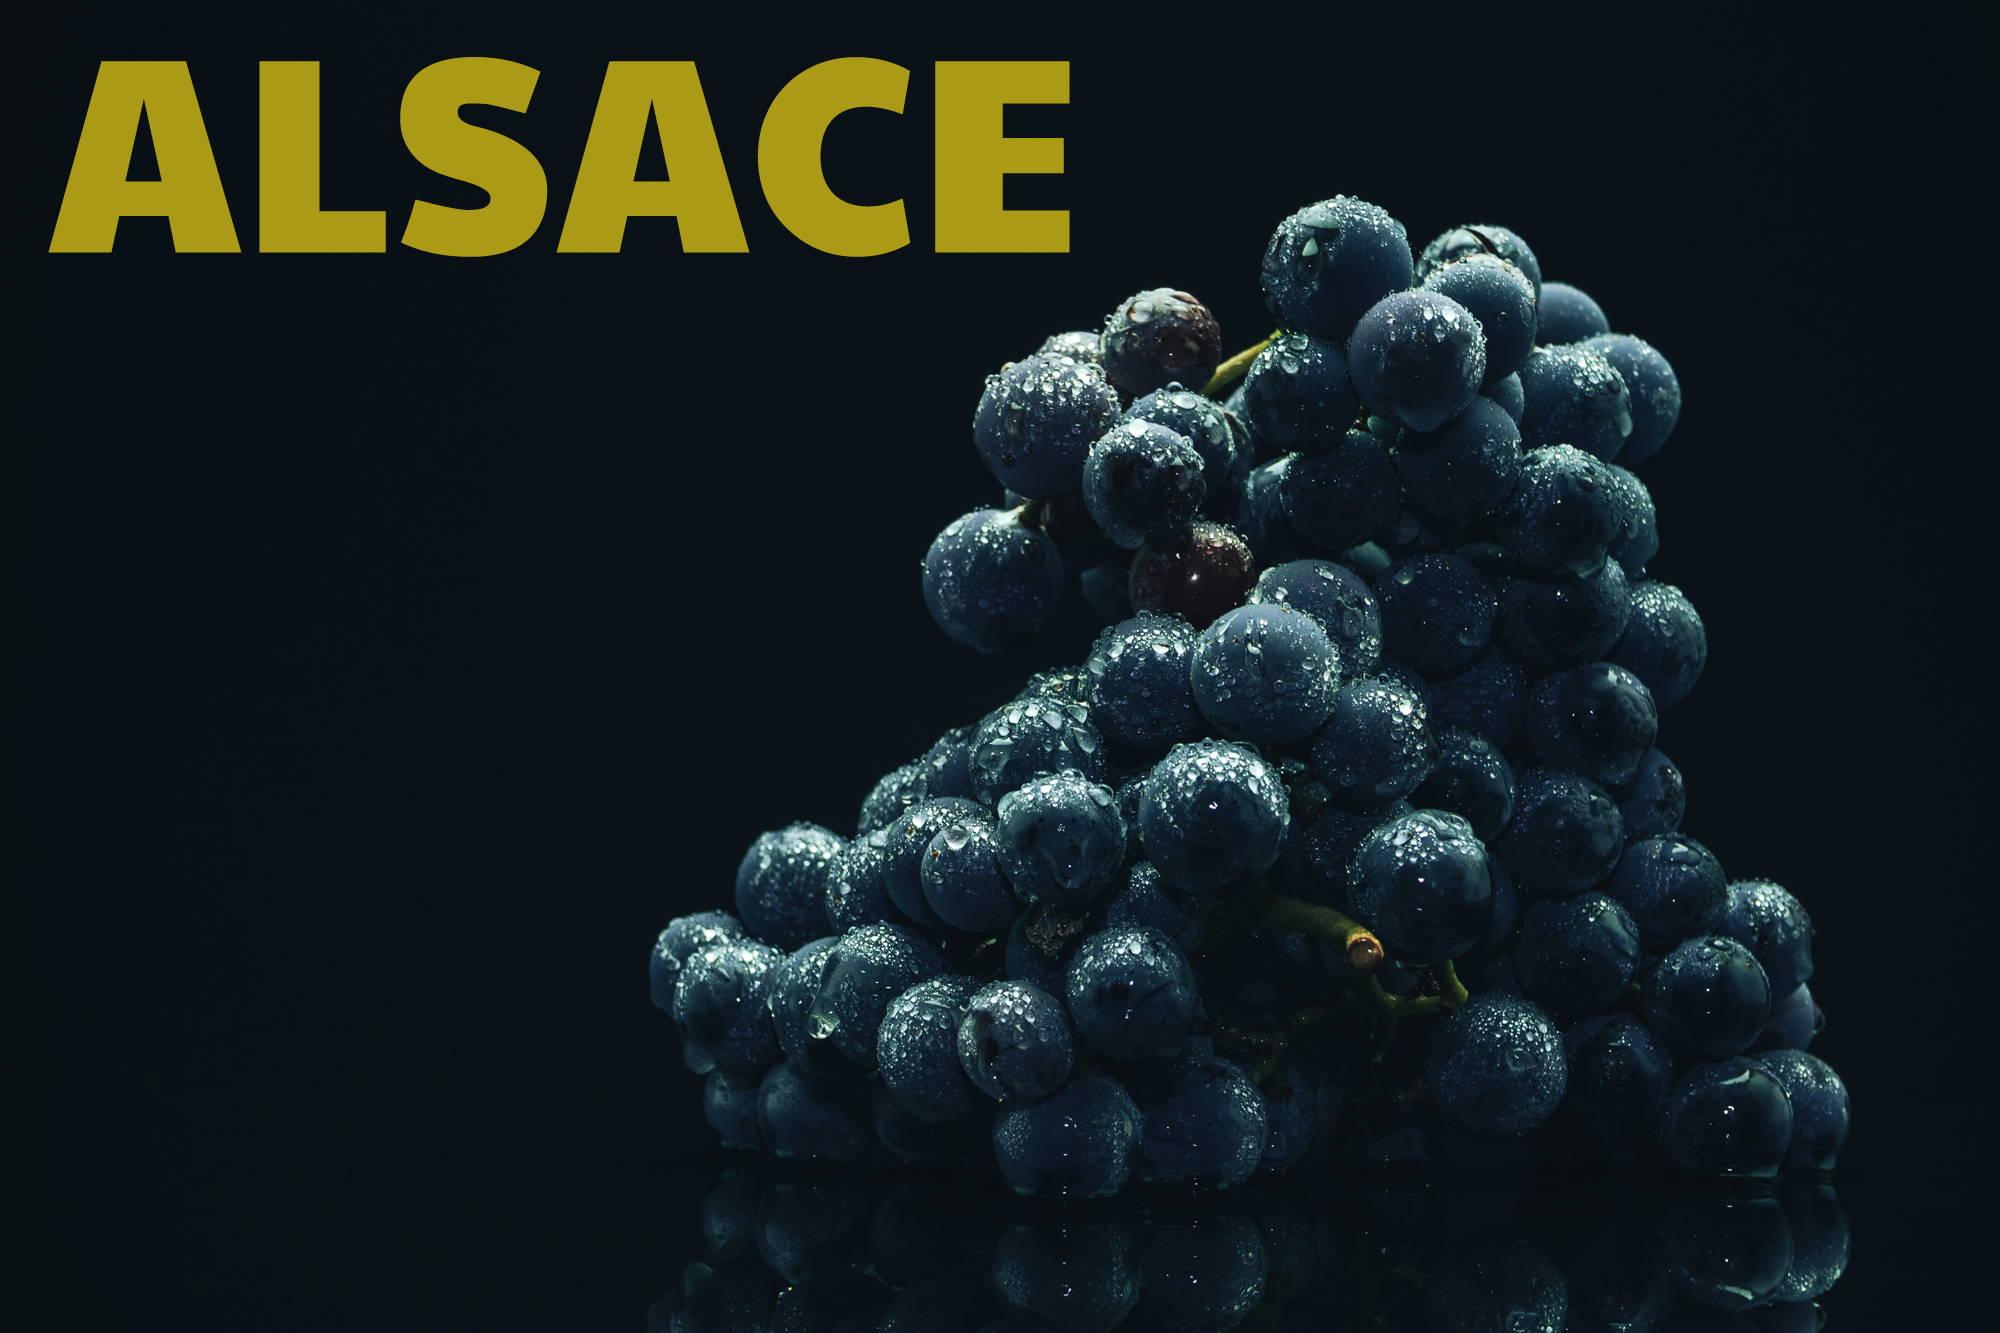 France, vin nature, rawwine, organic wine, vin bio, vin sans intrants, bistro brute, vin rouge, vin blanc, rouge, blanc, nature, vin propre, vigneron, vigneron indépendant, domaine bio, biodynamie, vigneron nature, cave vin naturel, cave vin, caviste, vin biodynamique, bistro brute, Quimper, Finistère , alsace, christian binner, buecher